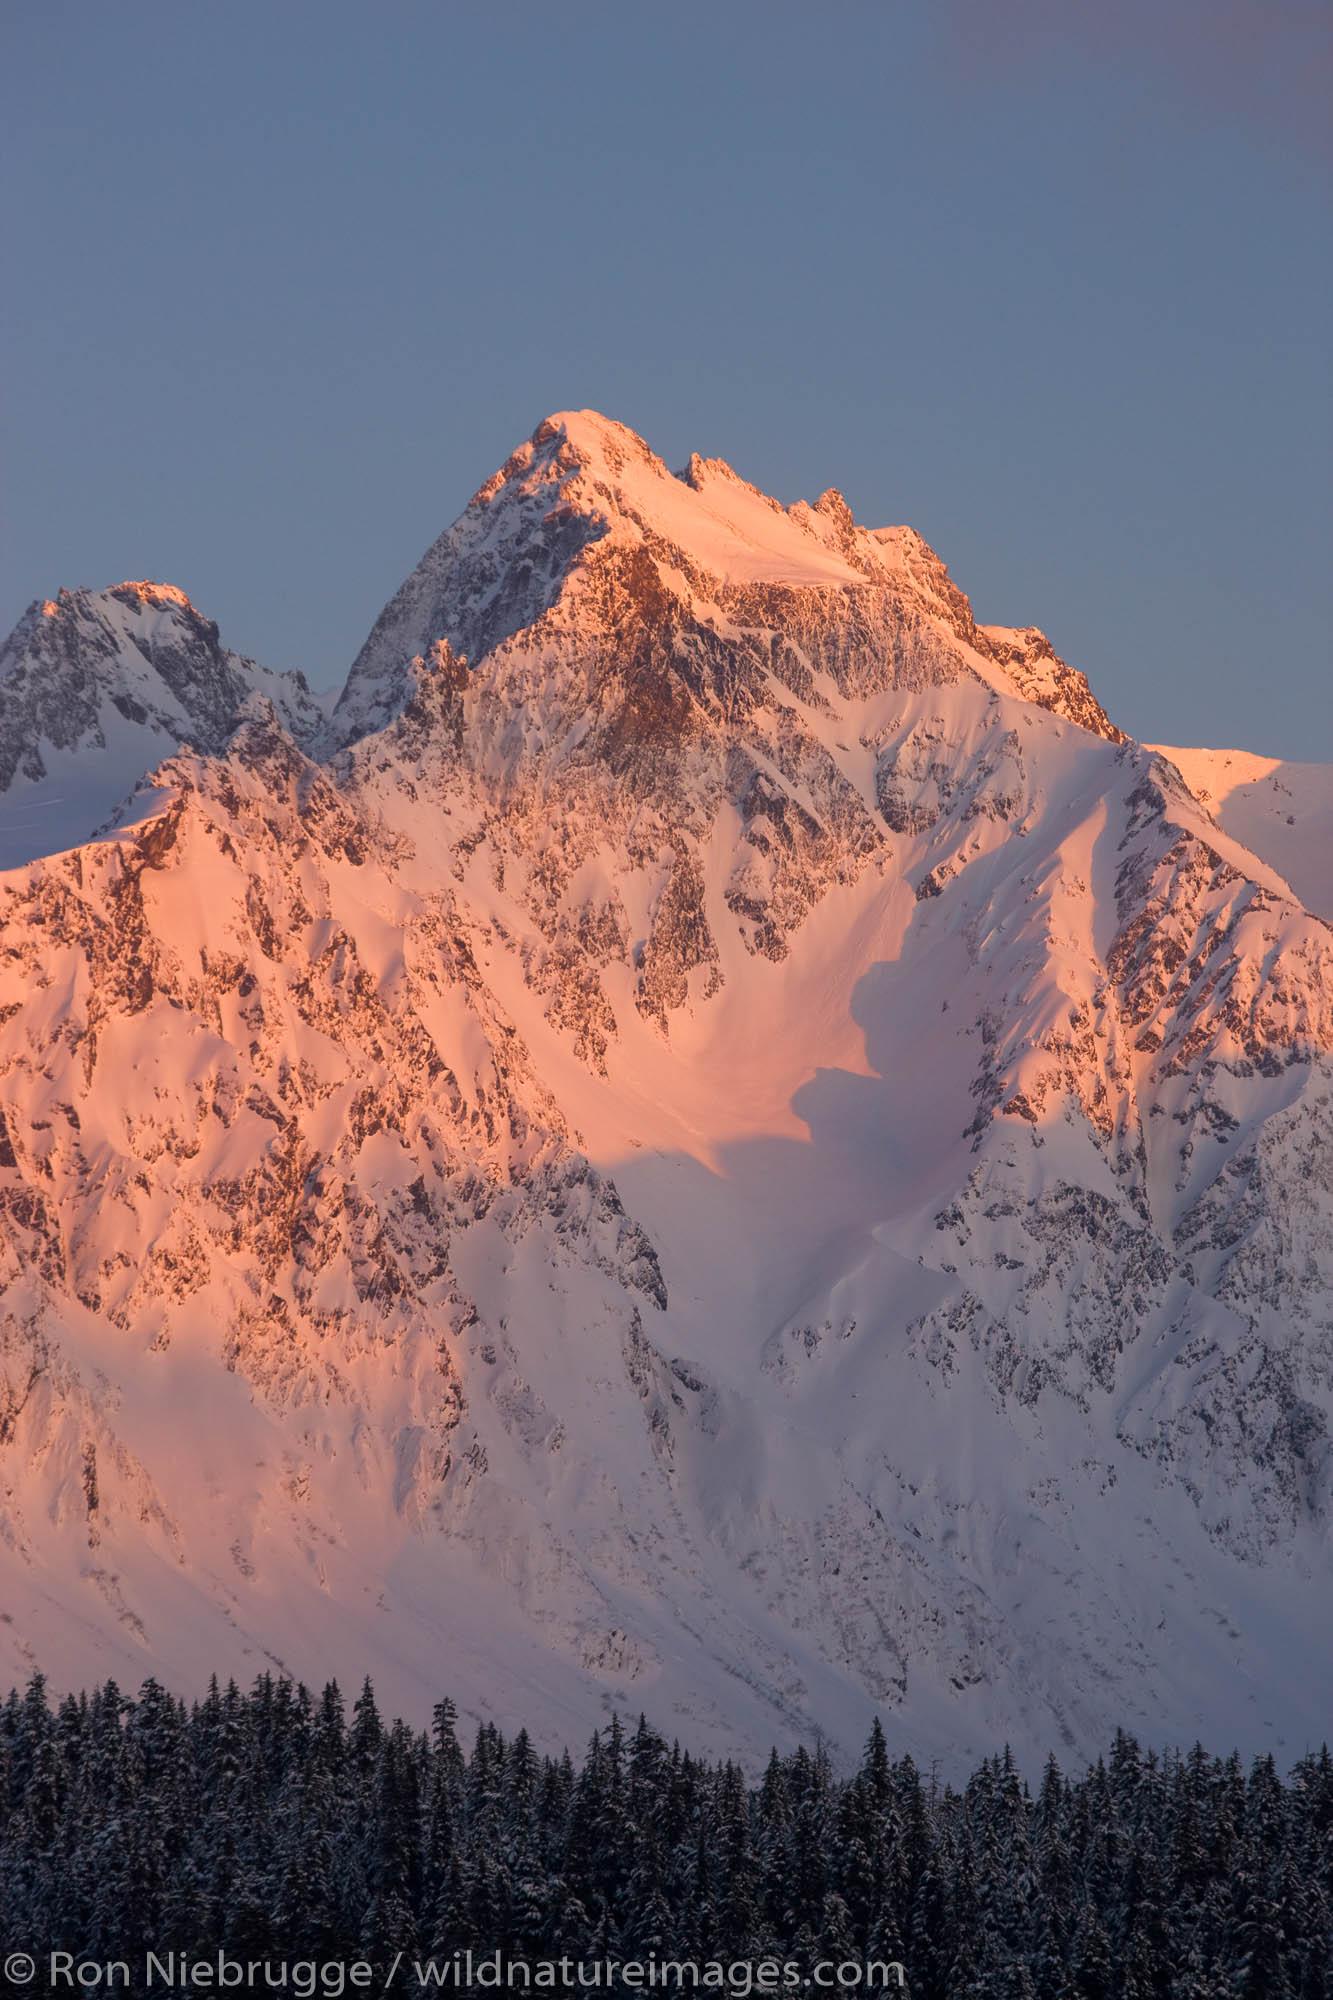 Winter in the Chugach National Forest, Seward, Alaska.